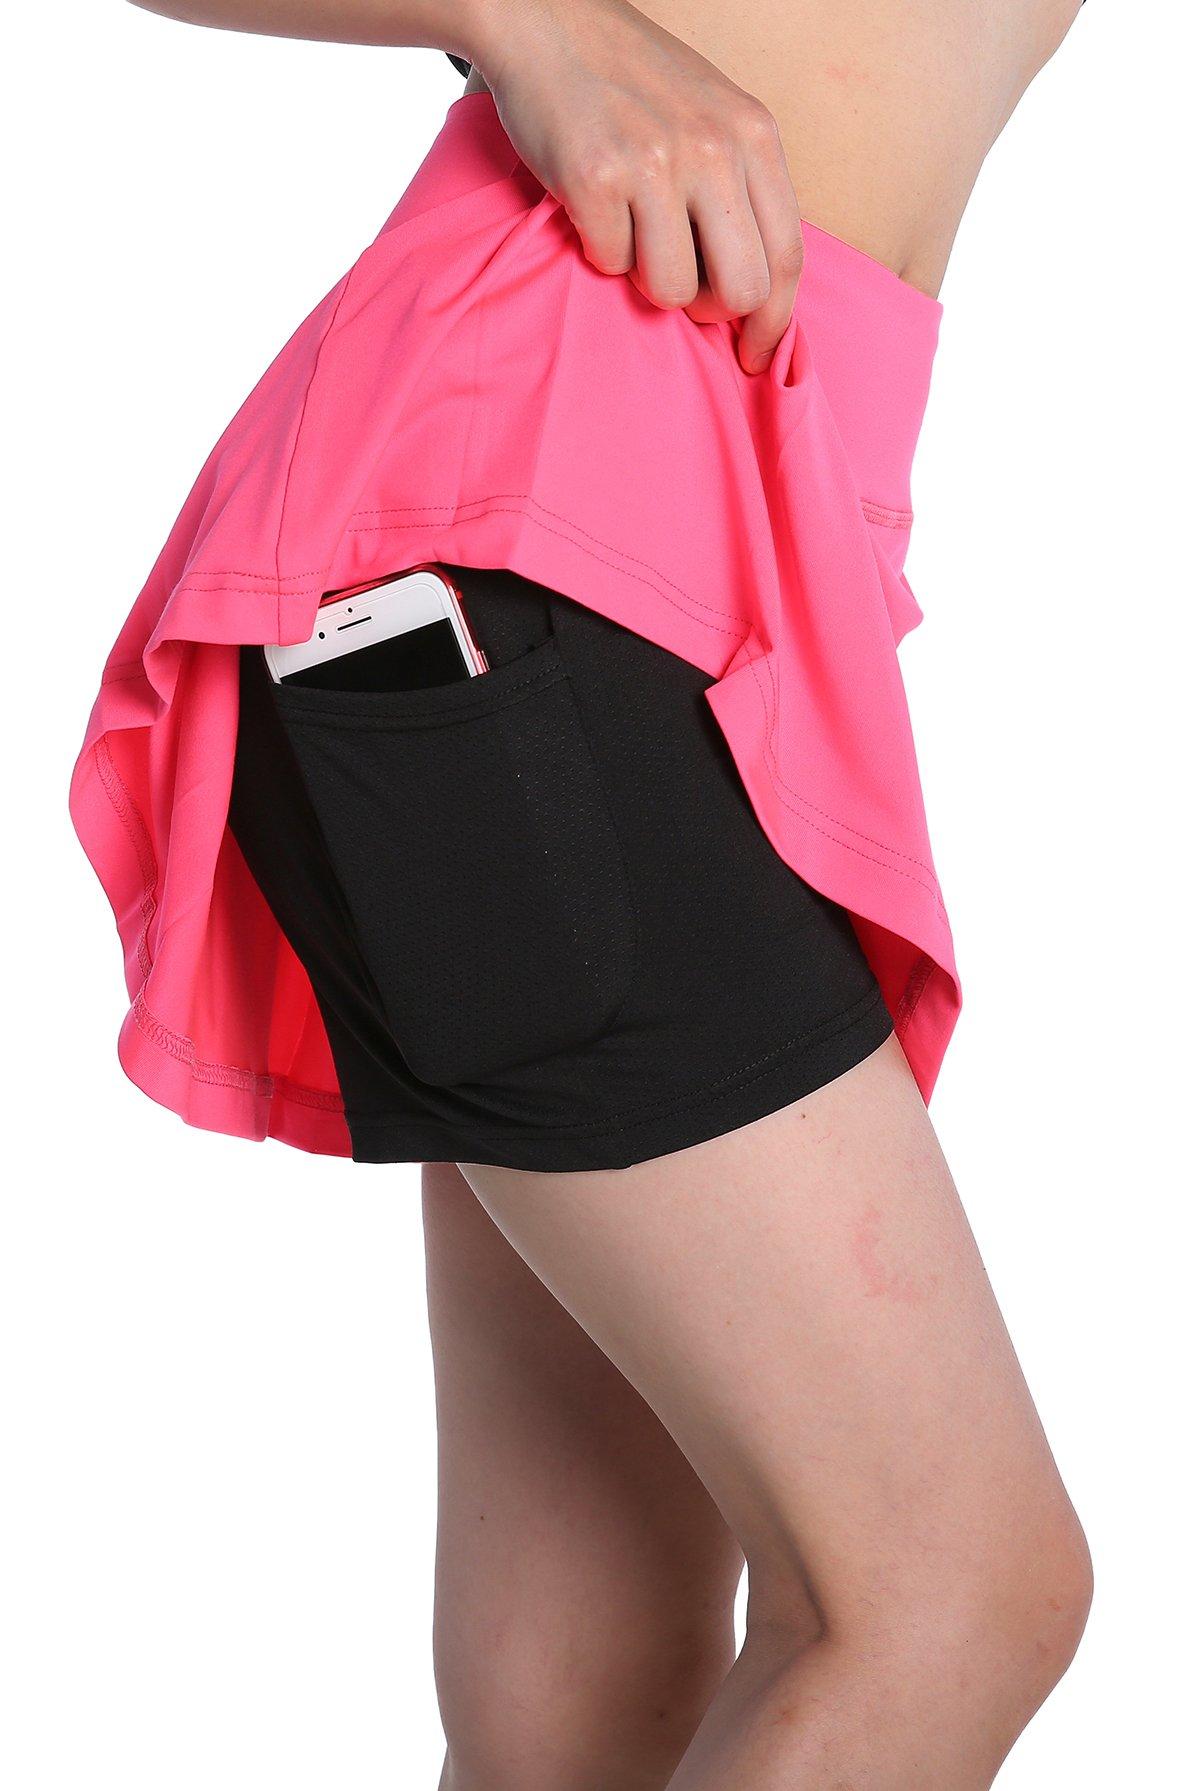 Annjoli womens running skorts golf tennis workout skirt (XL, Magenta)